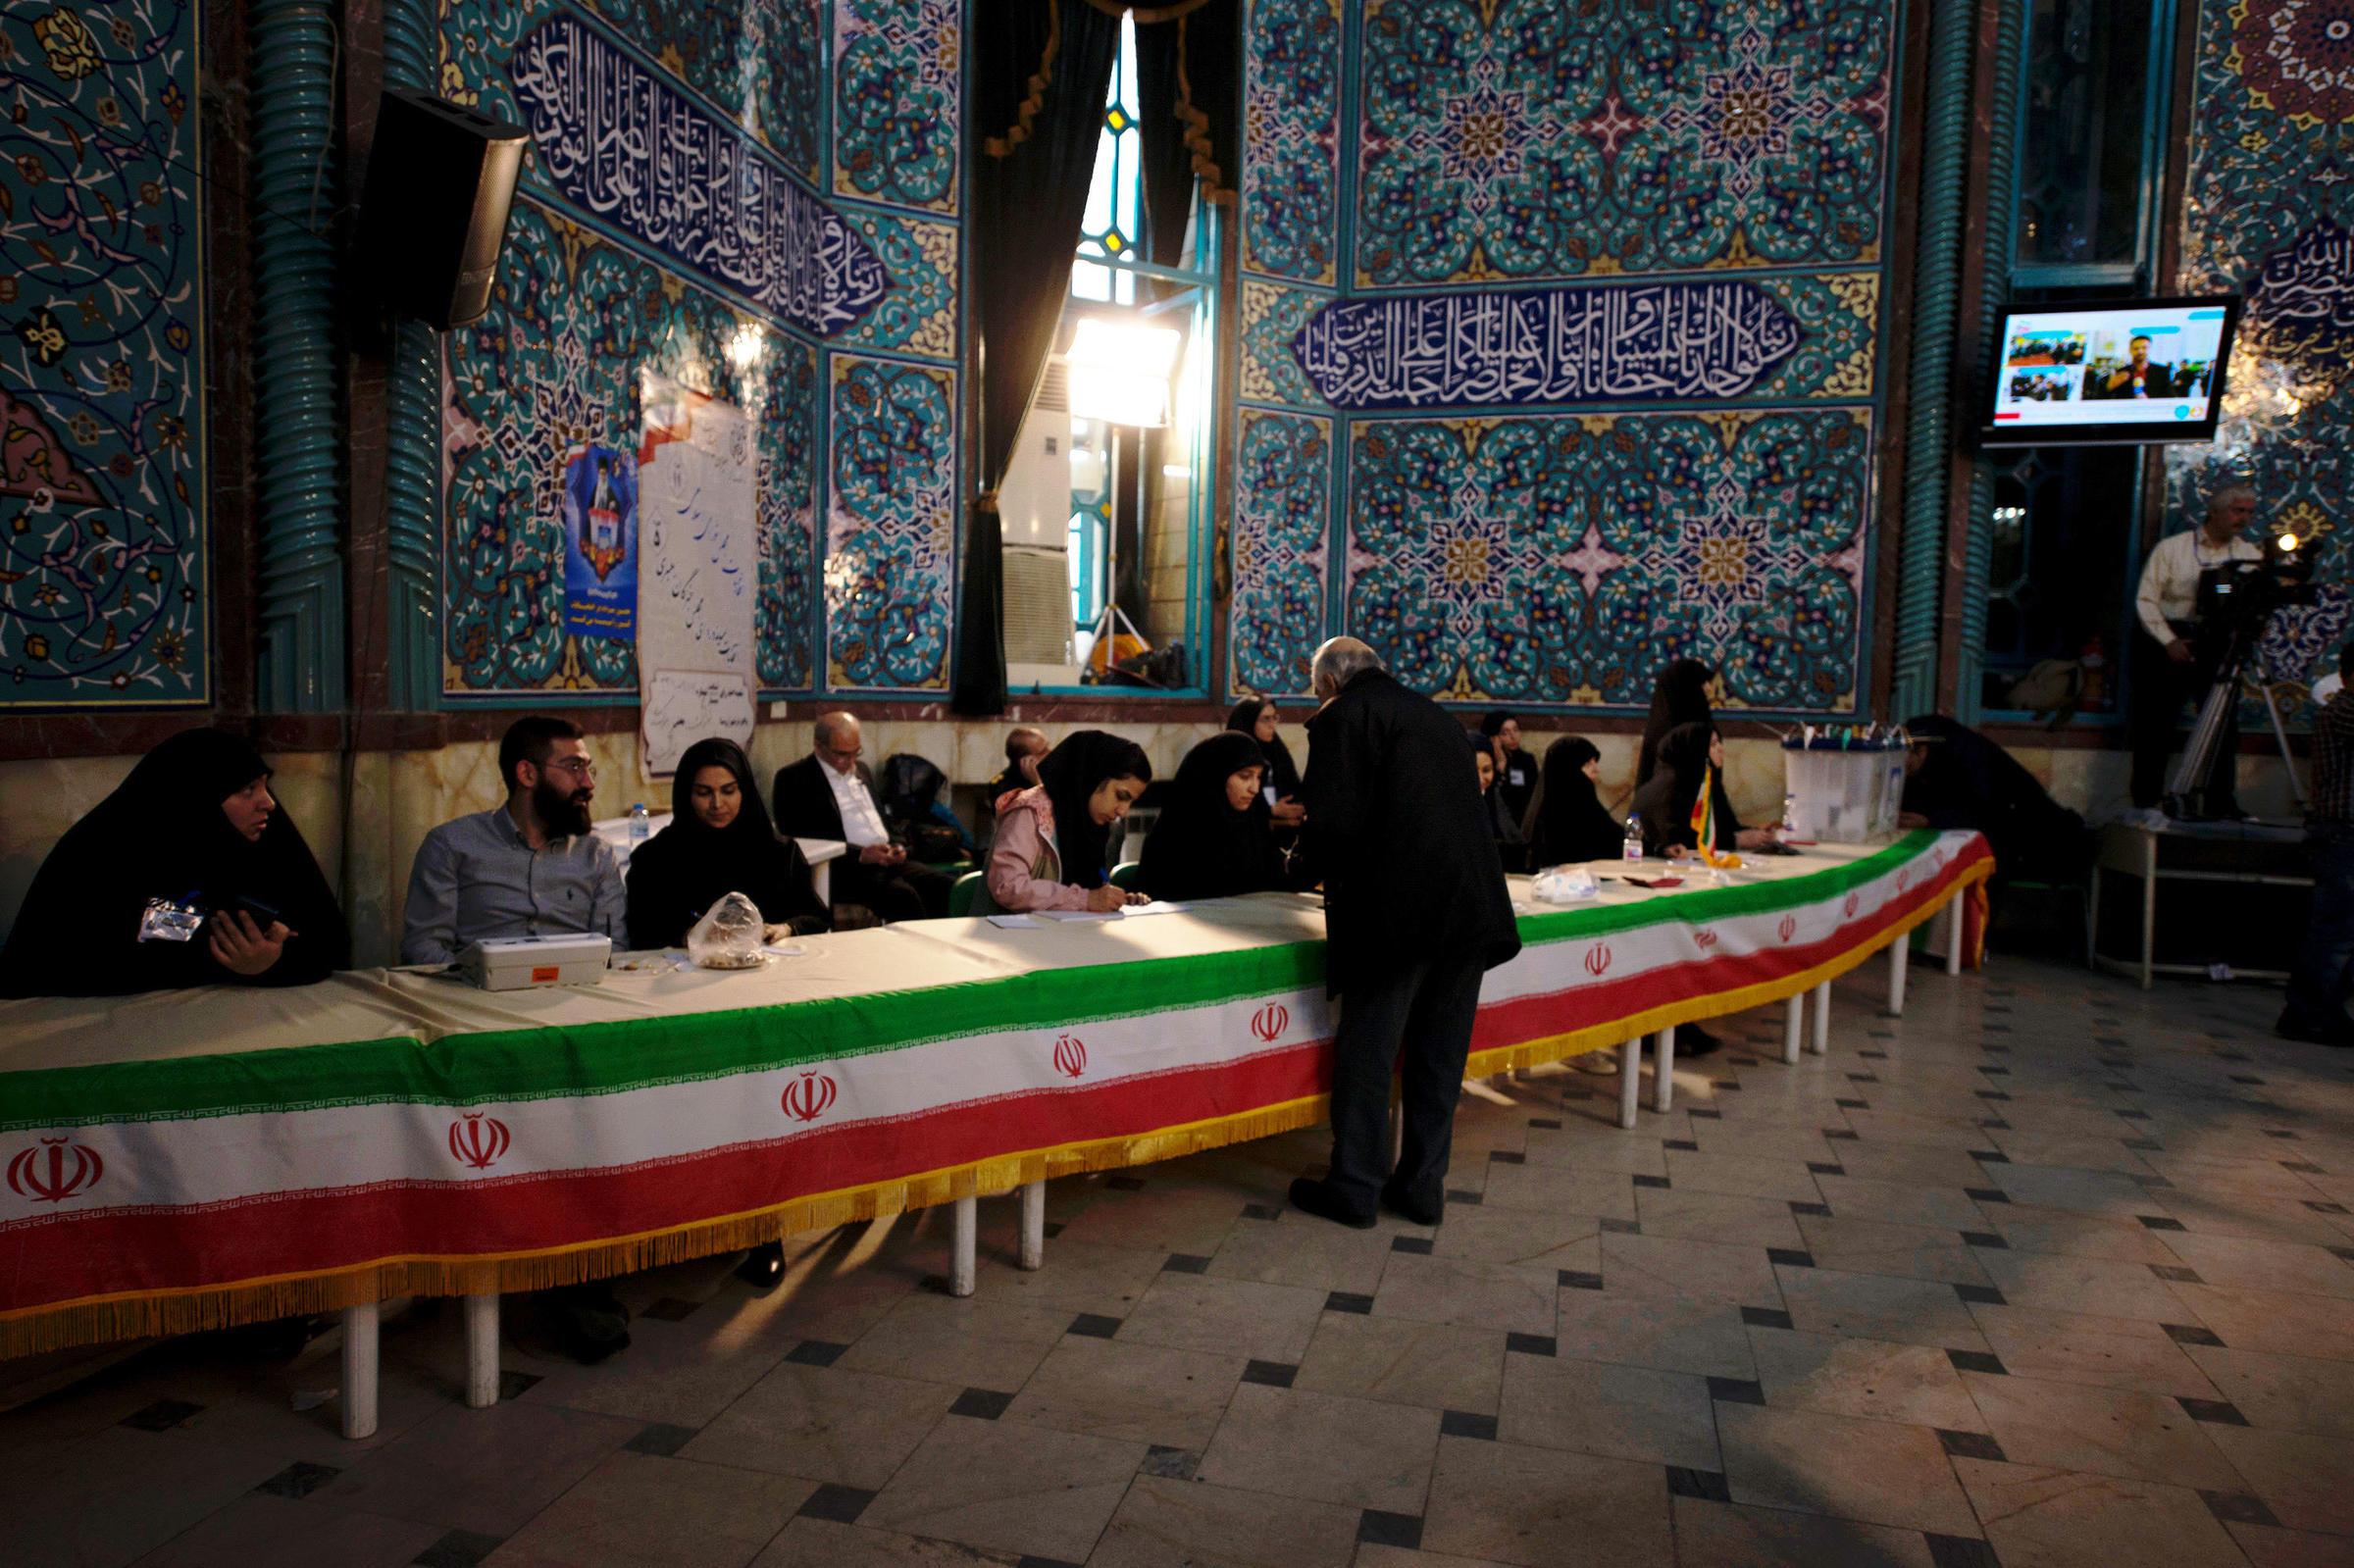 Iran's Rouhani says Tehran will never talk to USA under pressure